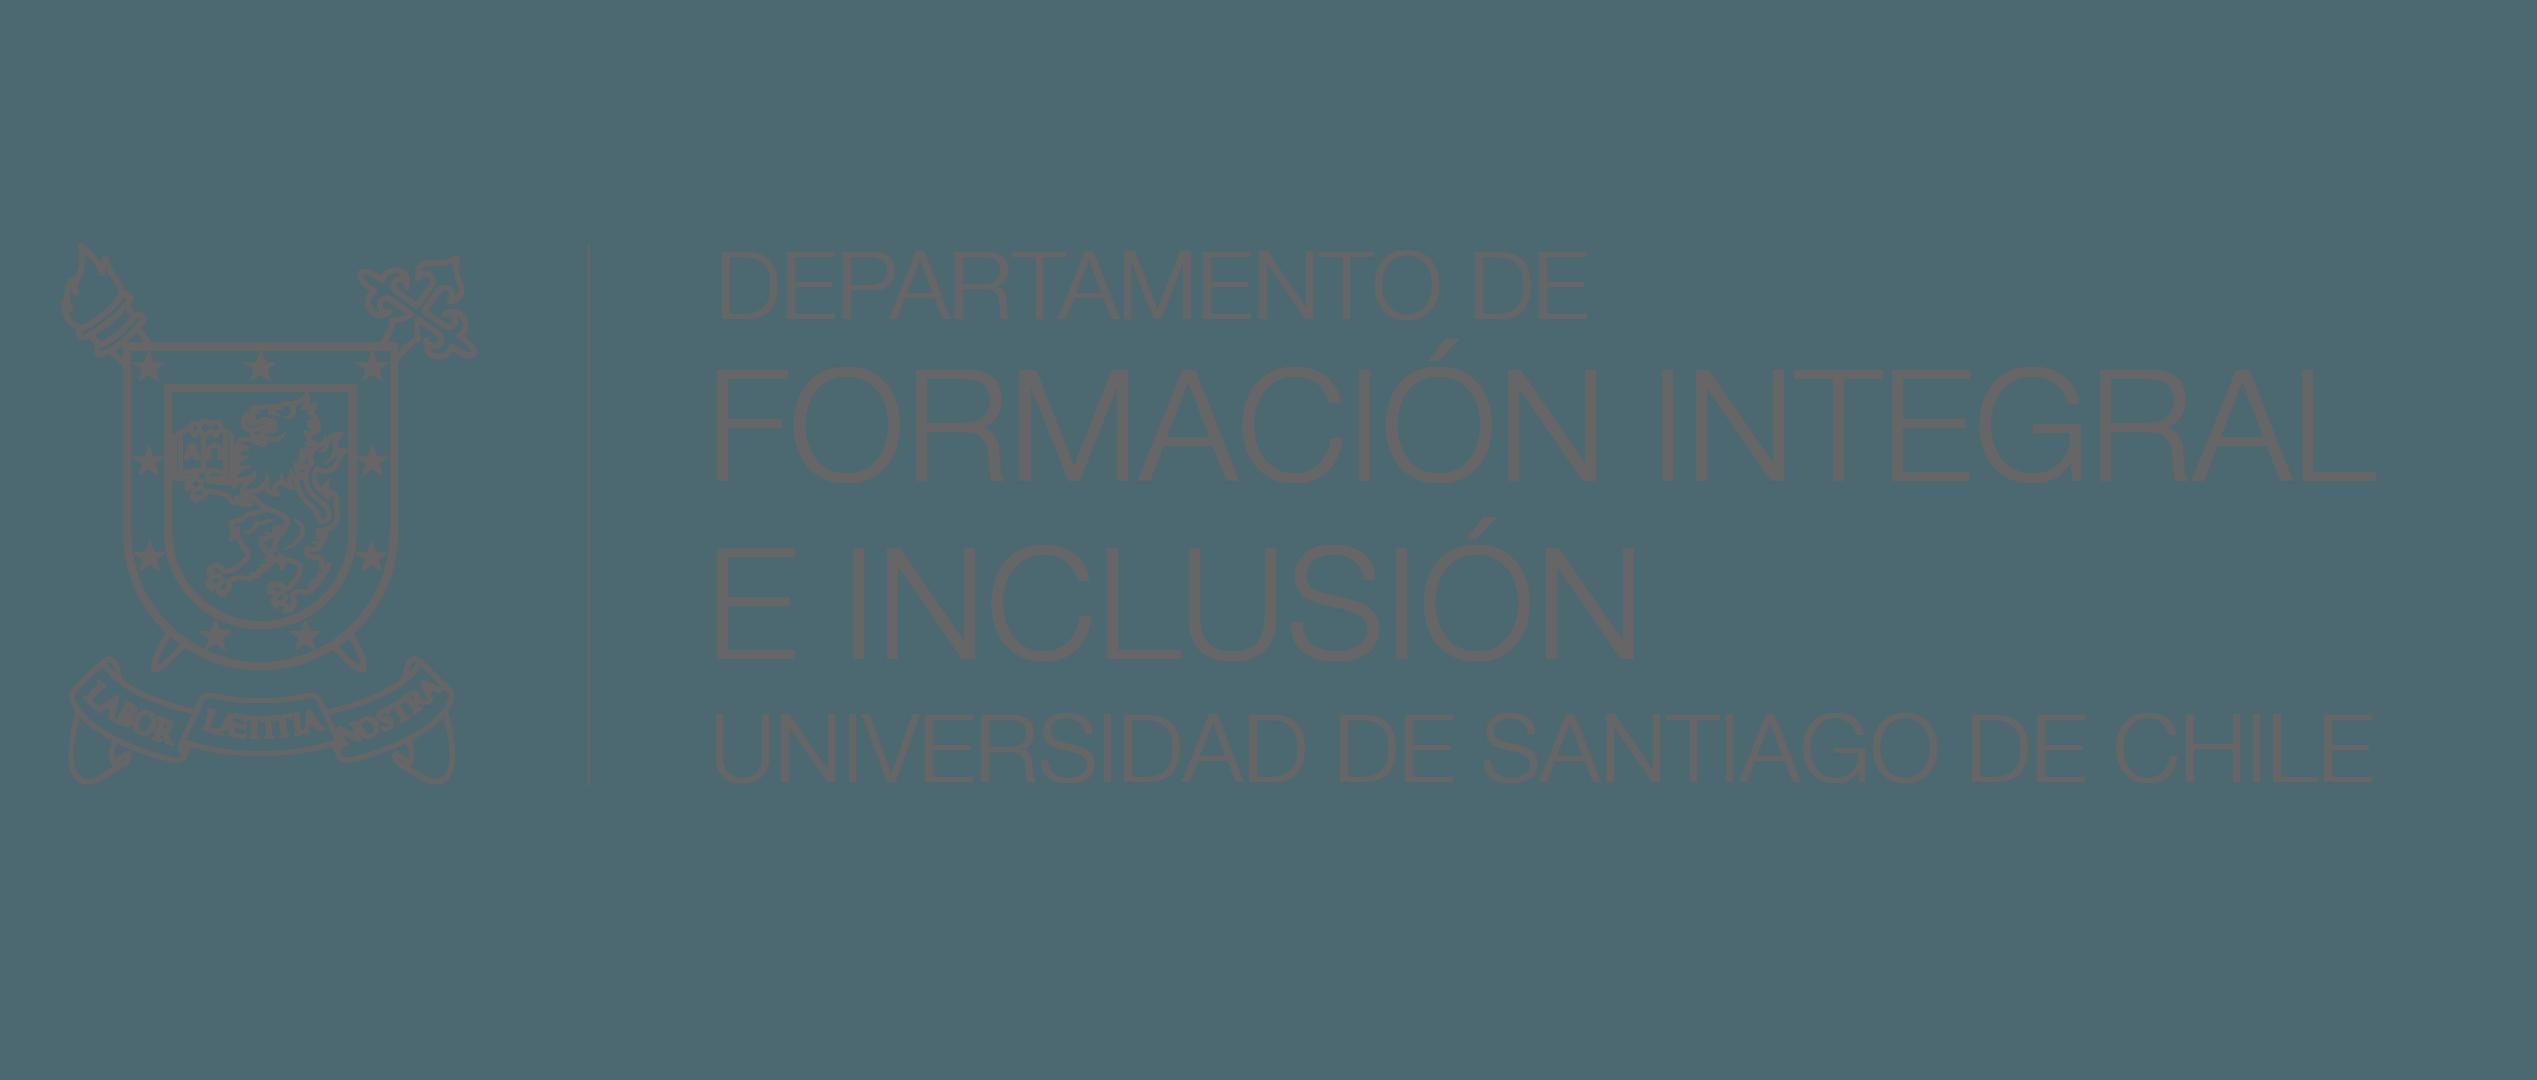 Departamento de Formación Integral e Inclusión